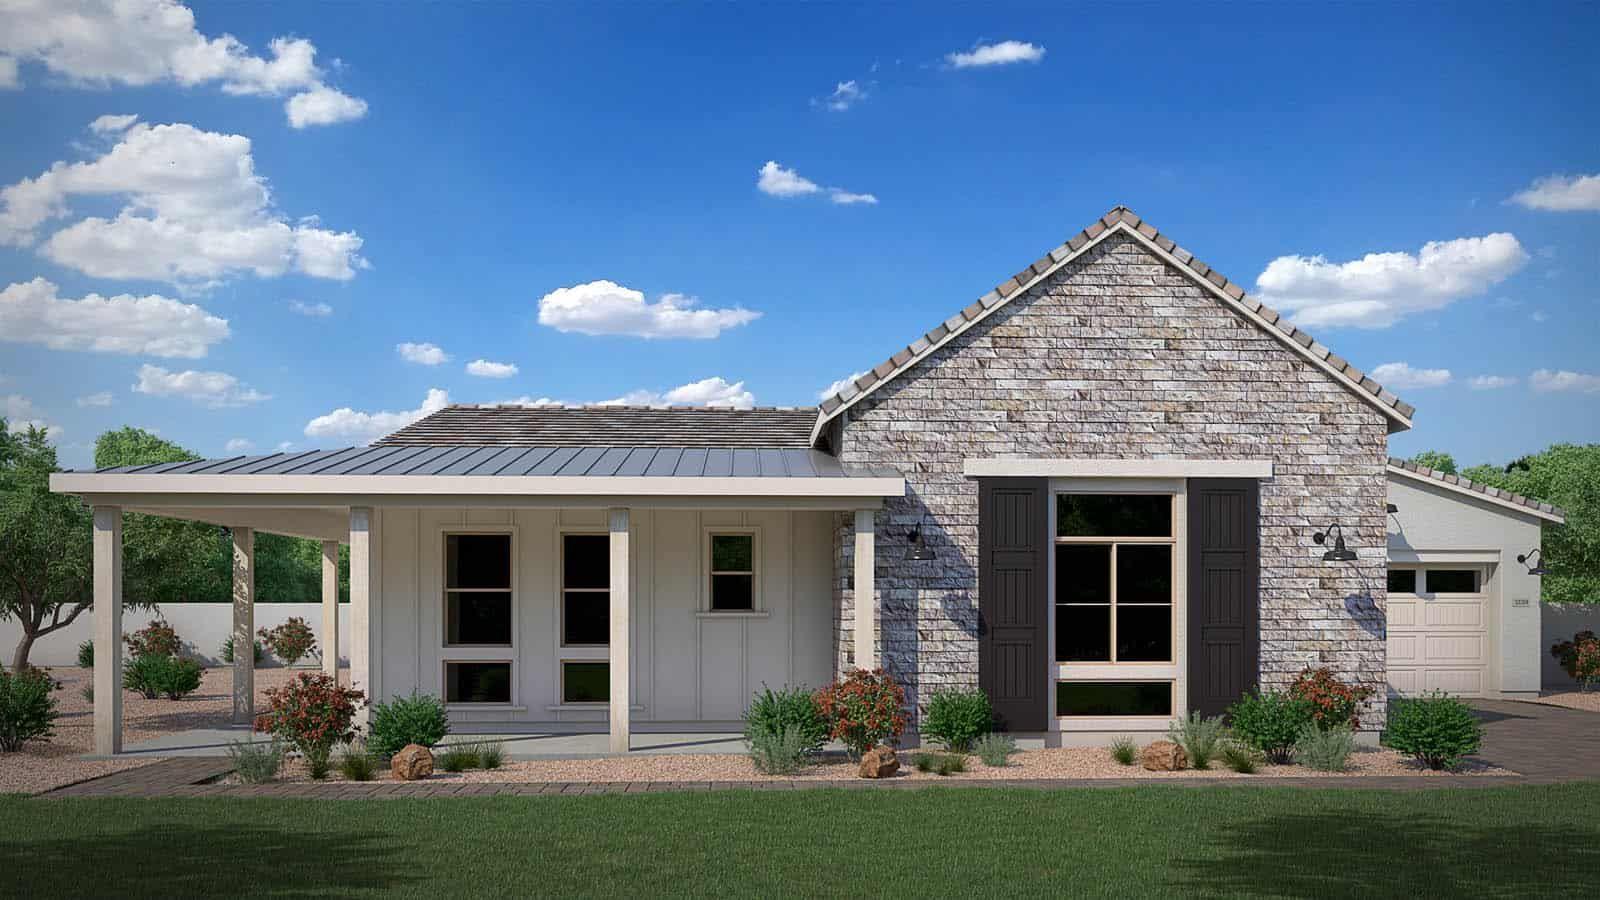 Farmhouse:Farmhouse Elevation